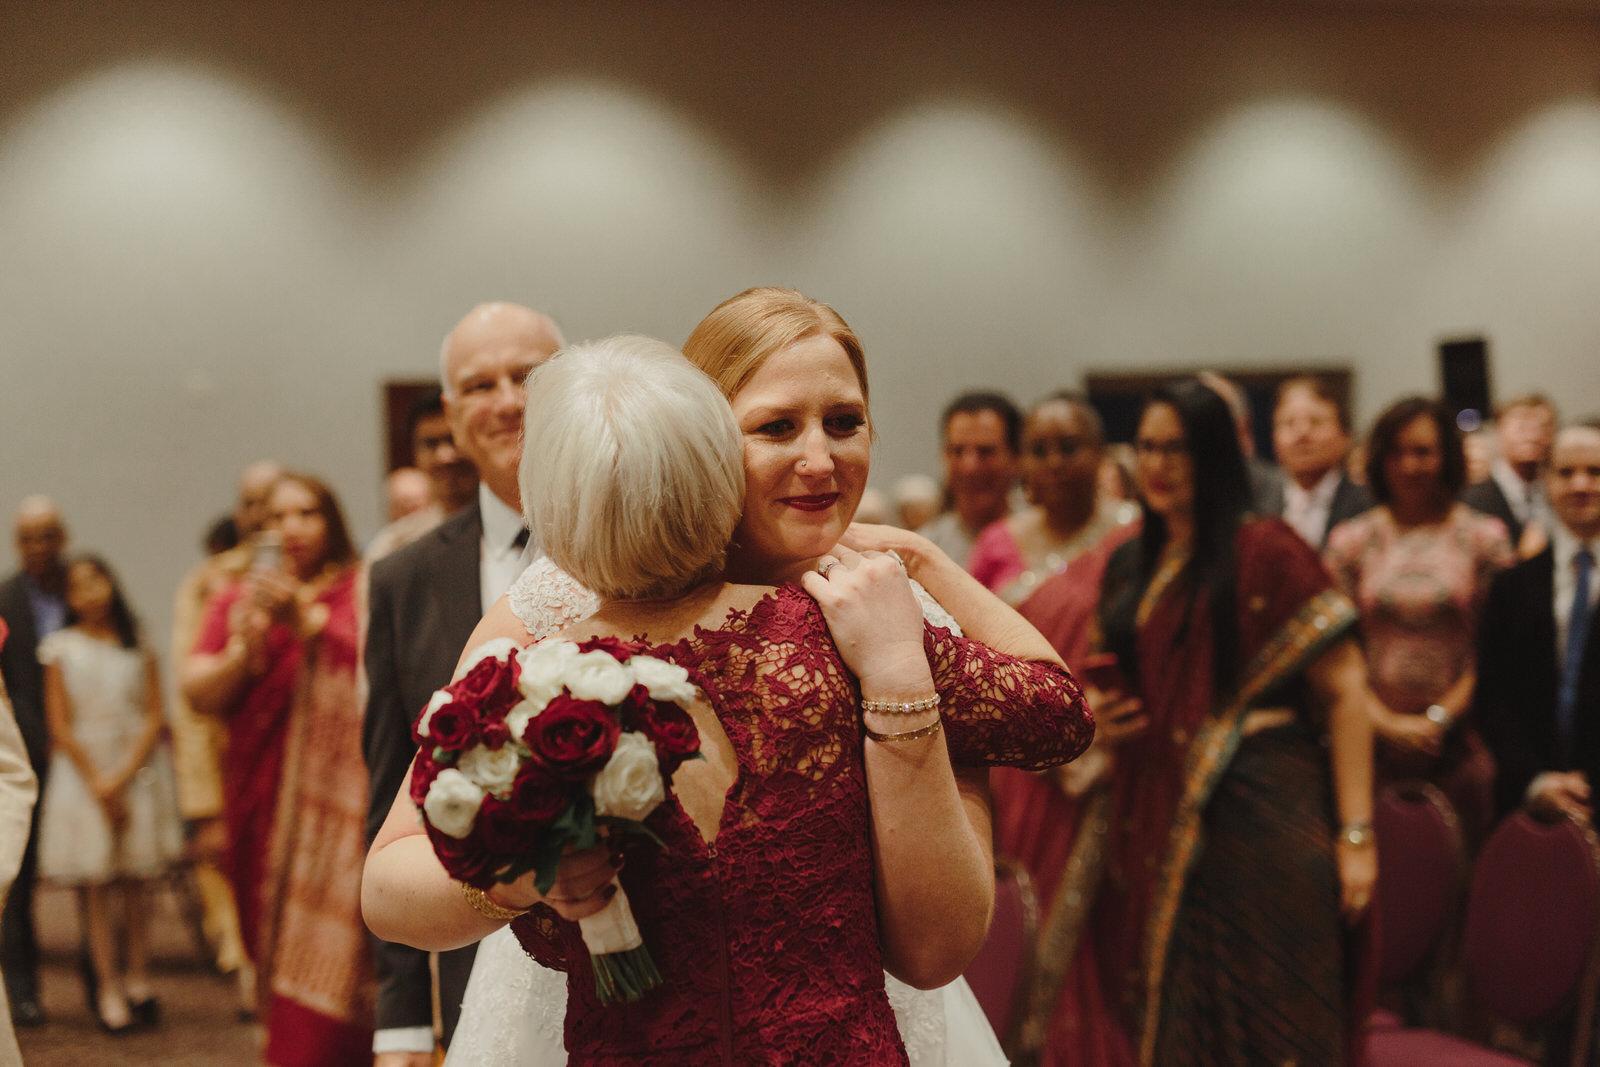 bride hugging guests at wedding